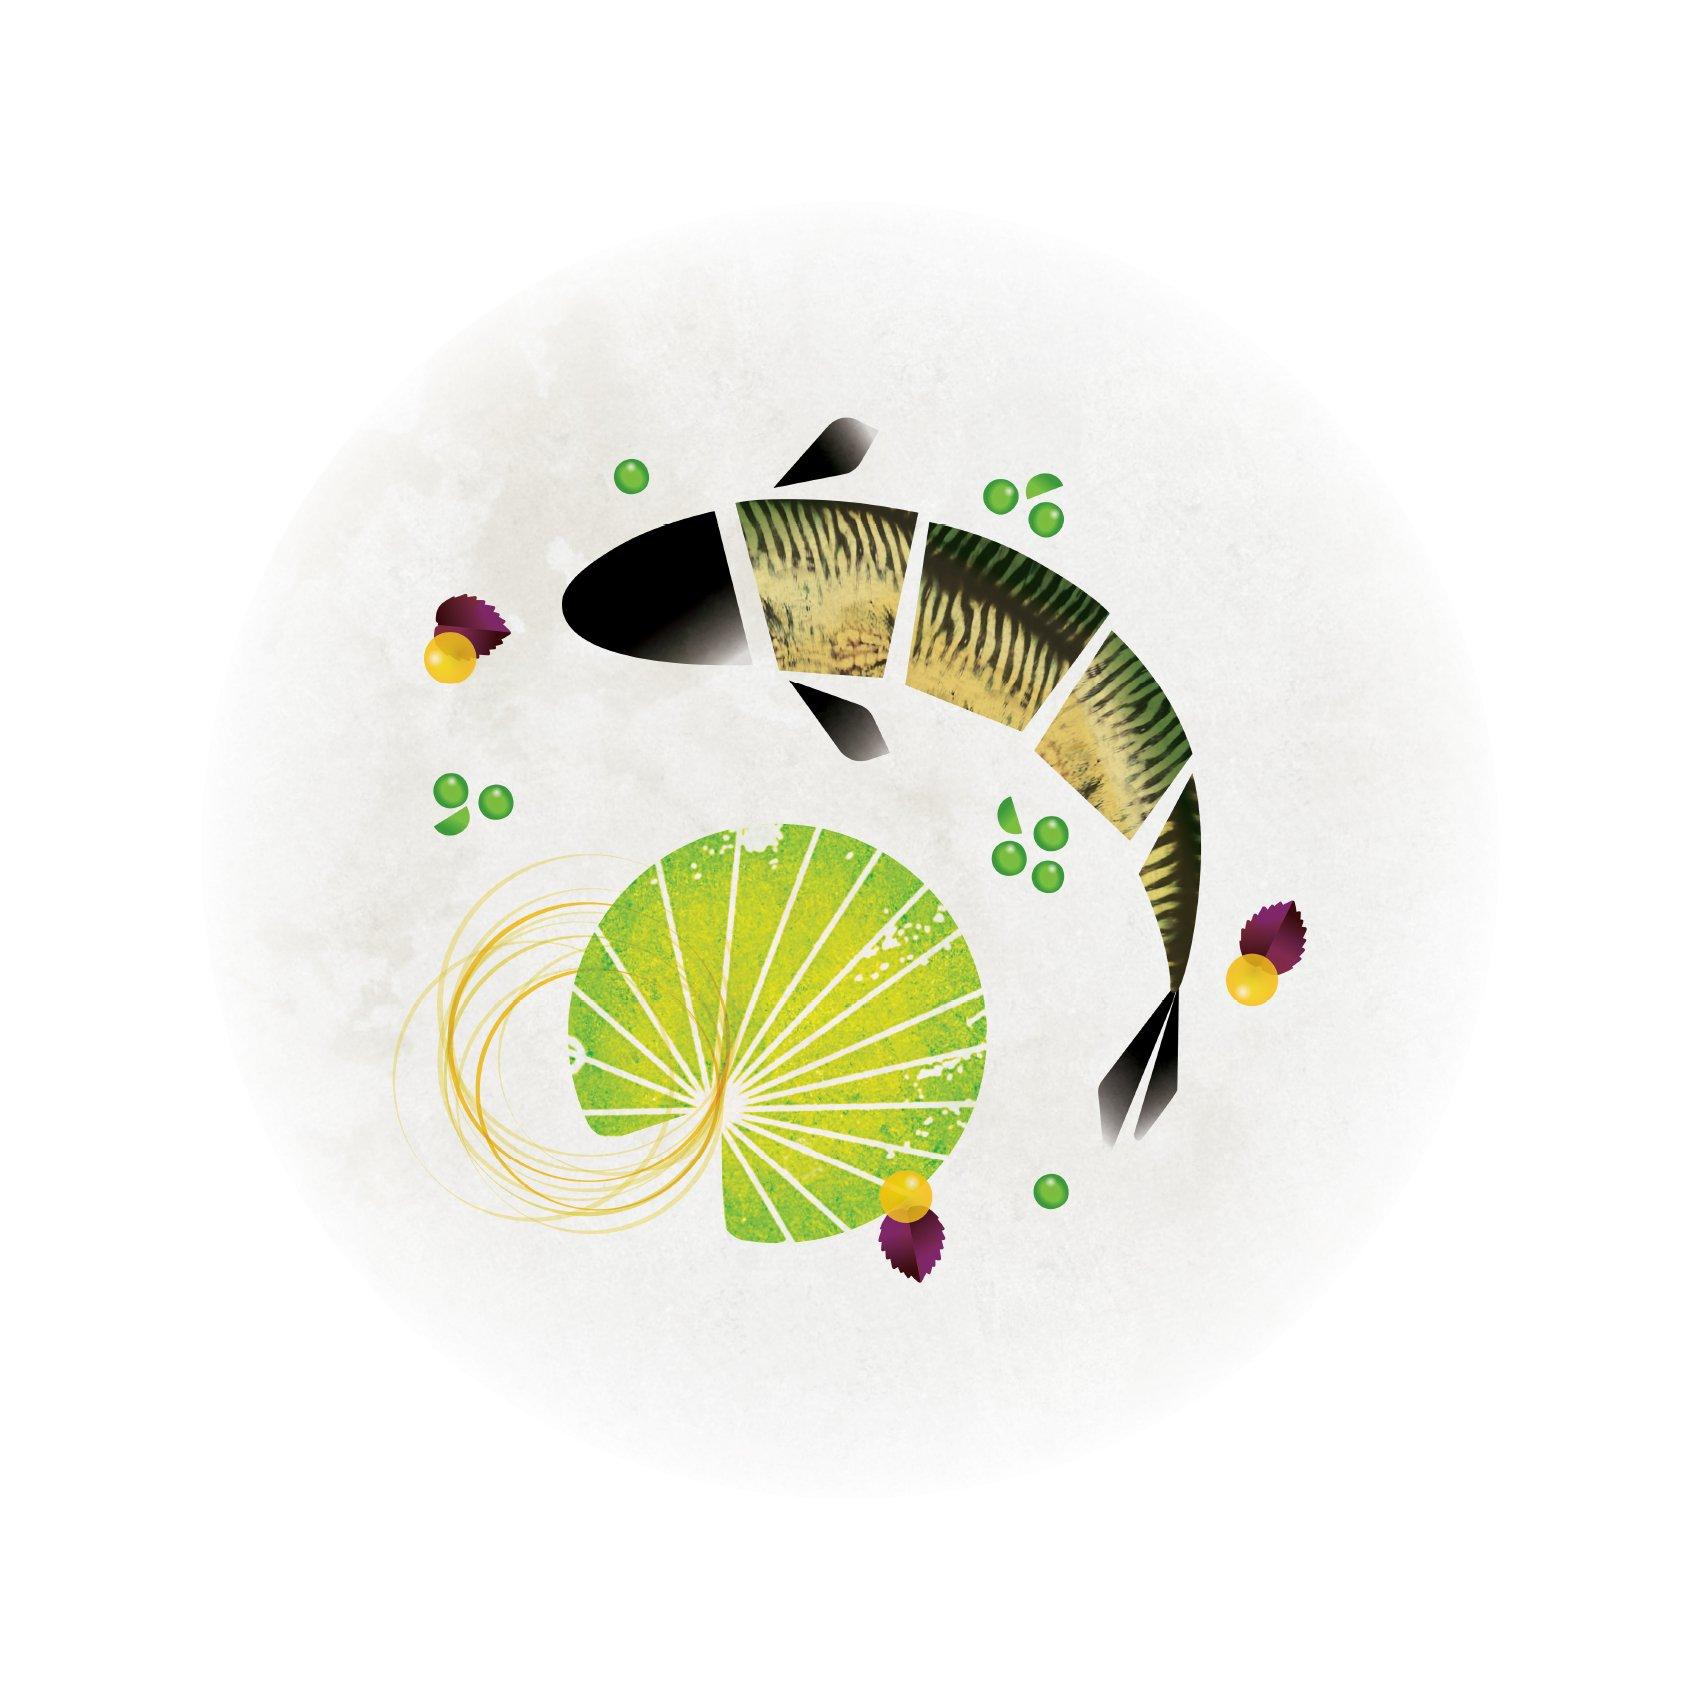 Sublime food design ricette in cibografica 32